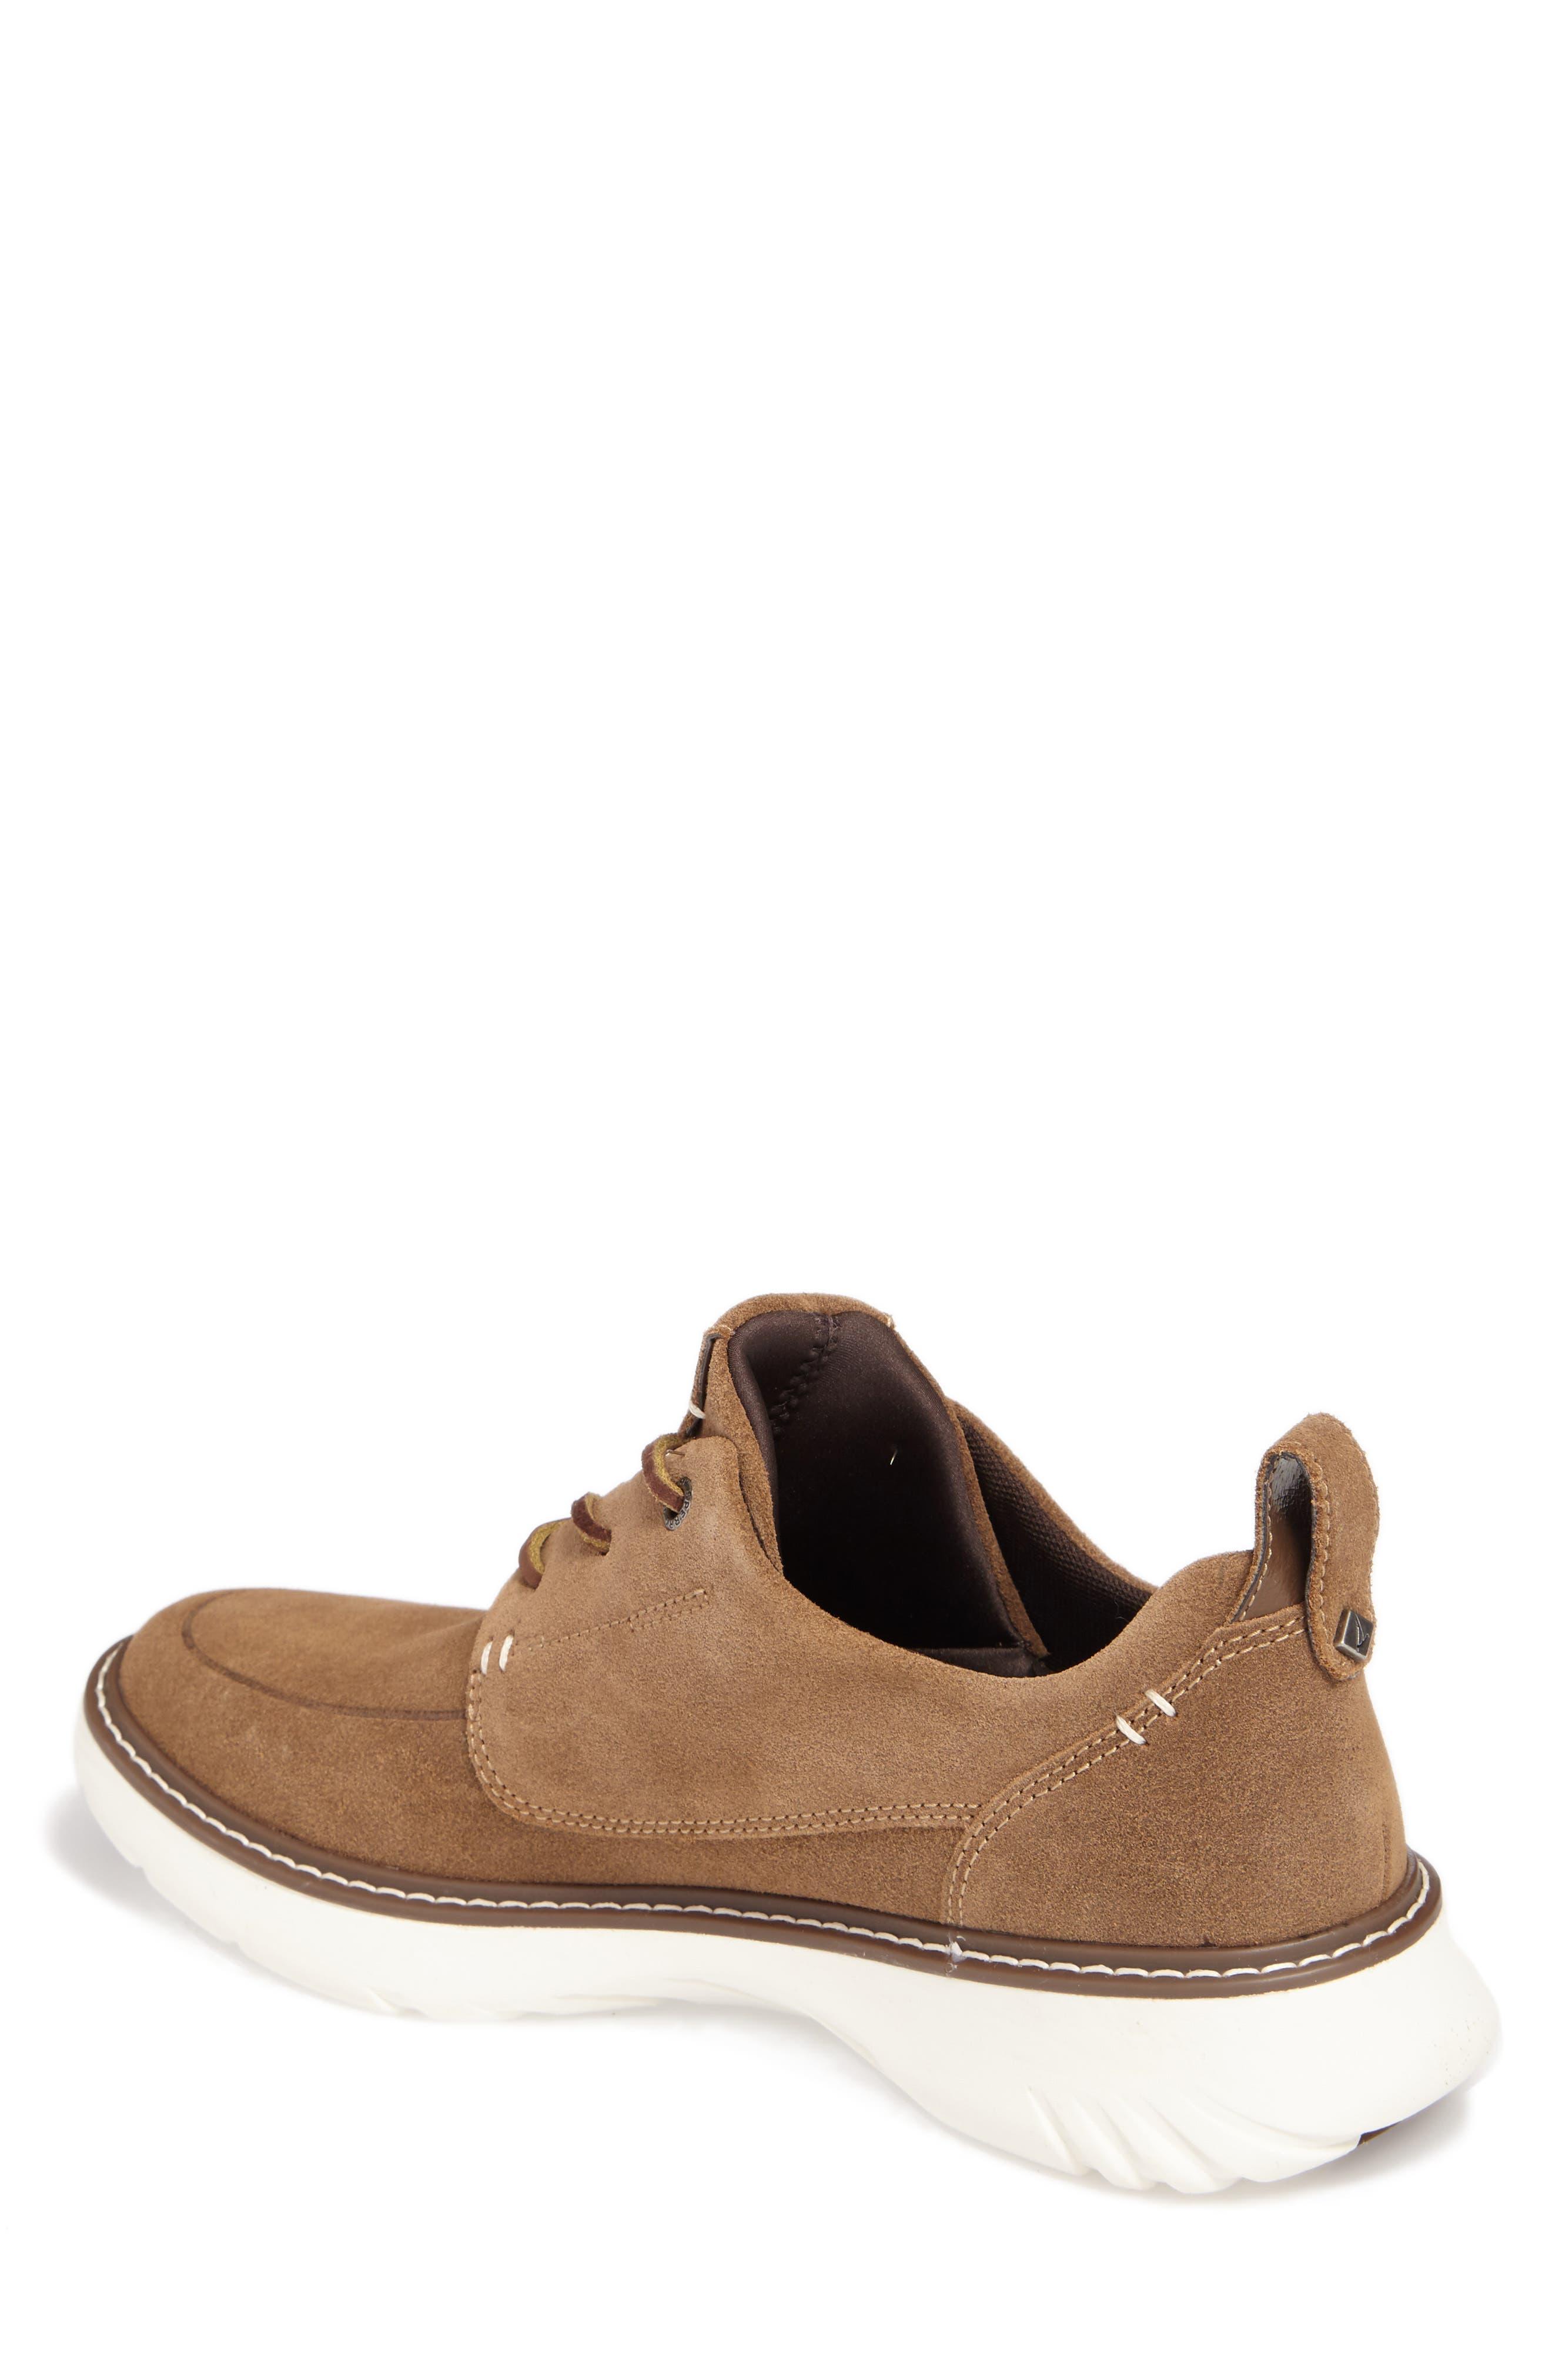 Element Chukka Boot,                             Alternate thumbnail 2, color,                             Carmel Leather